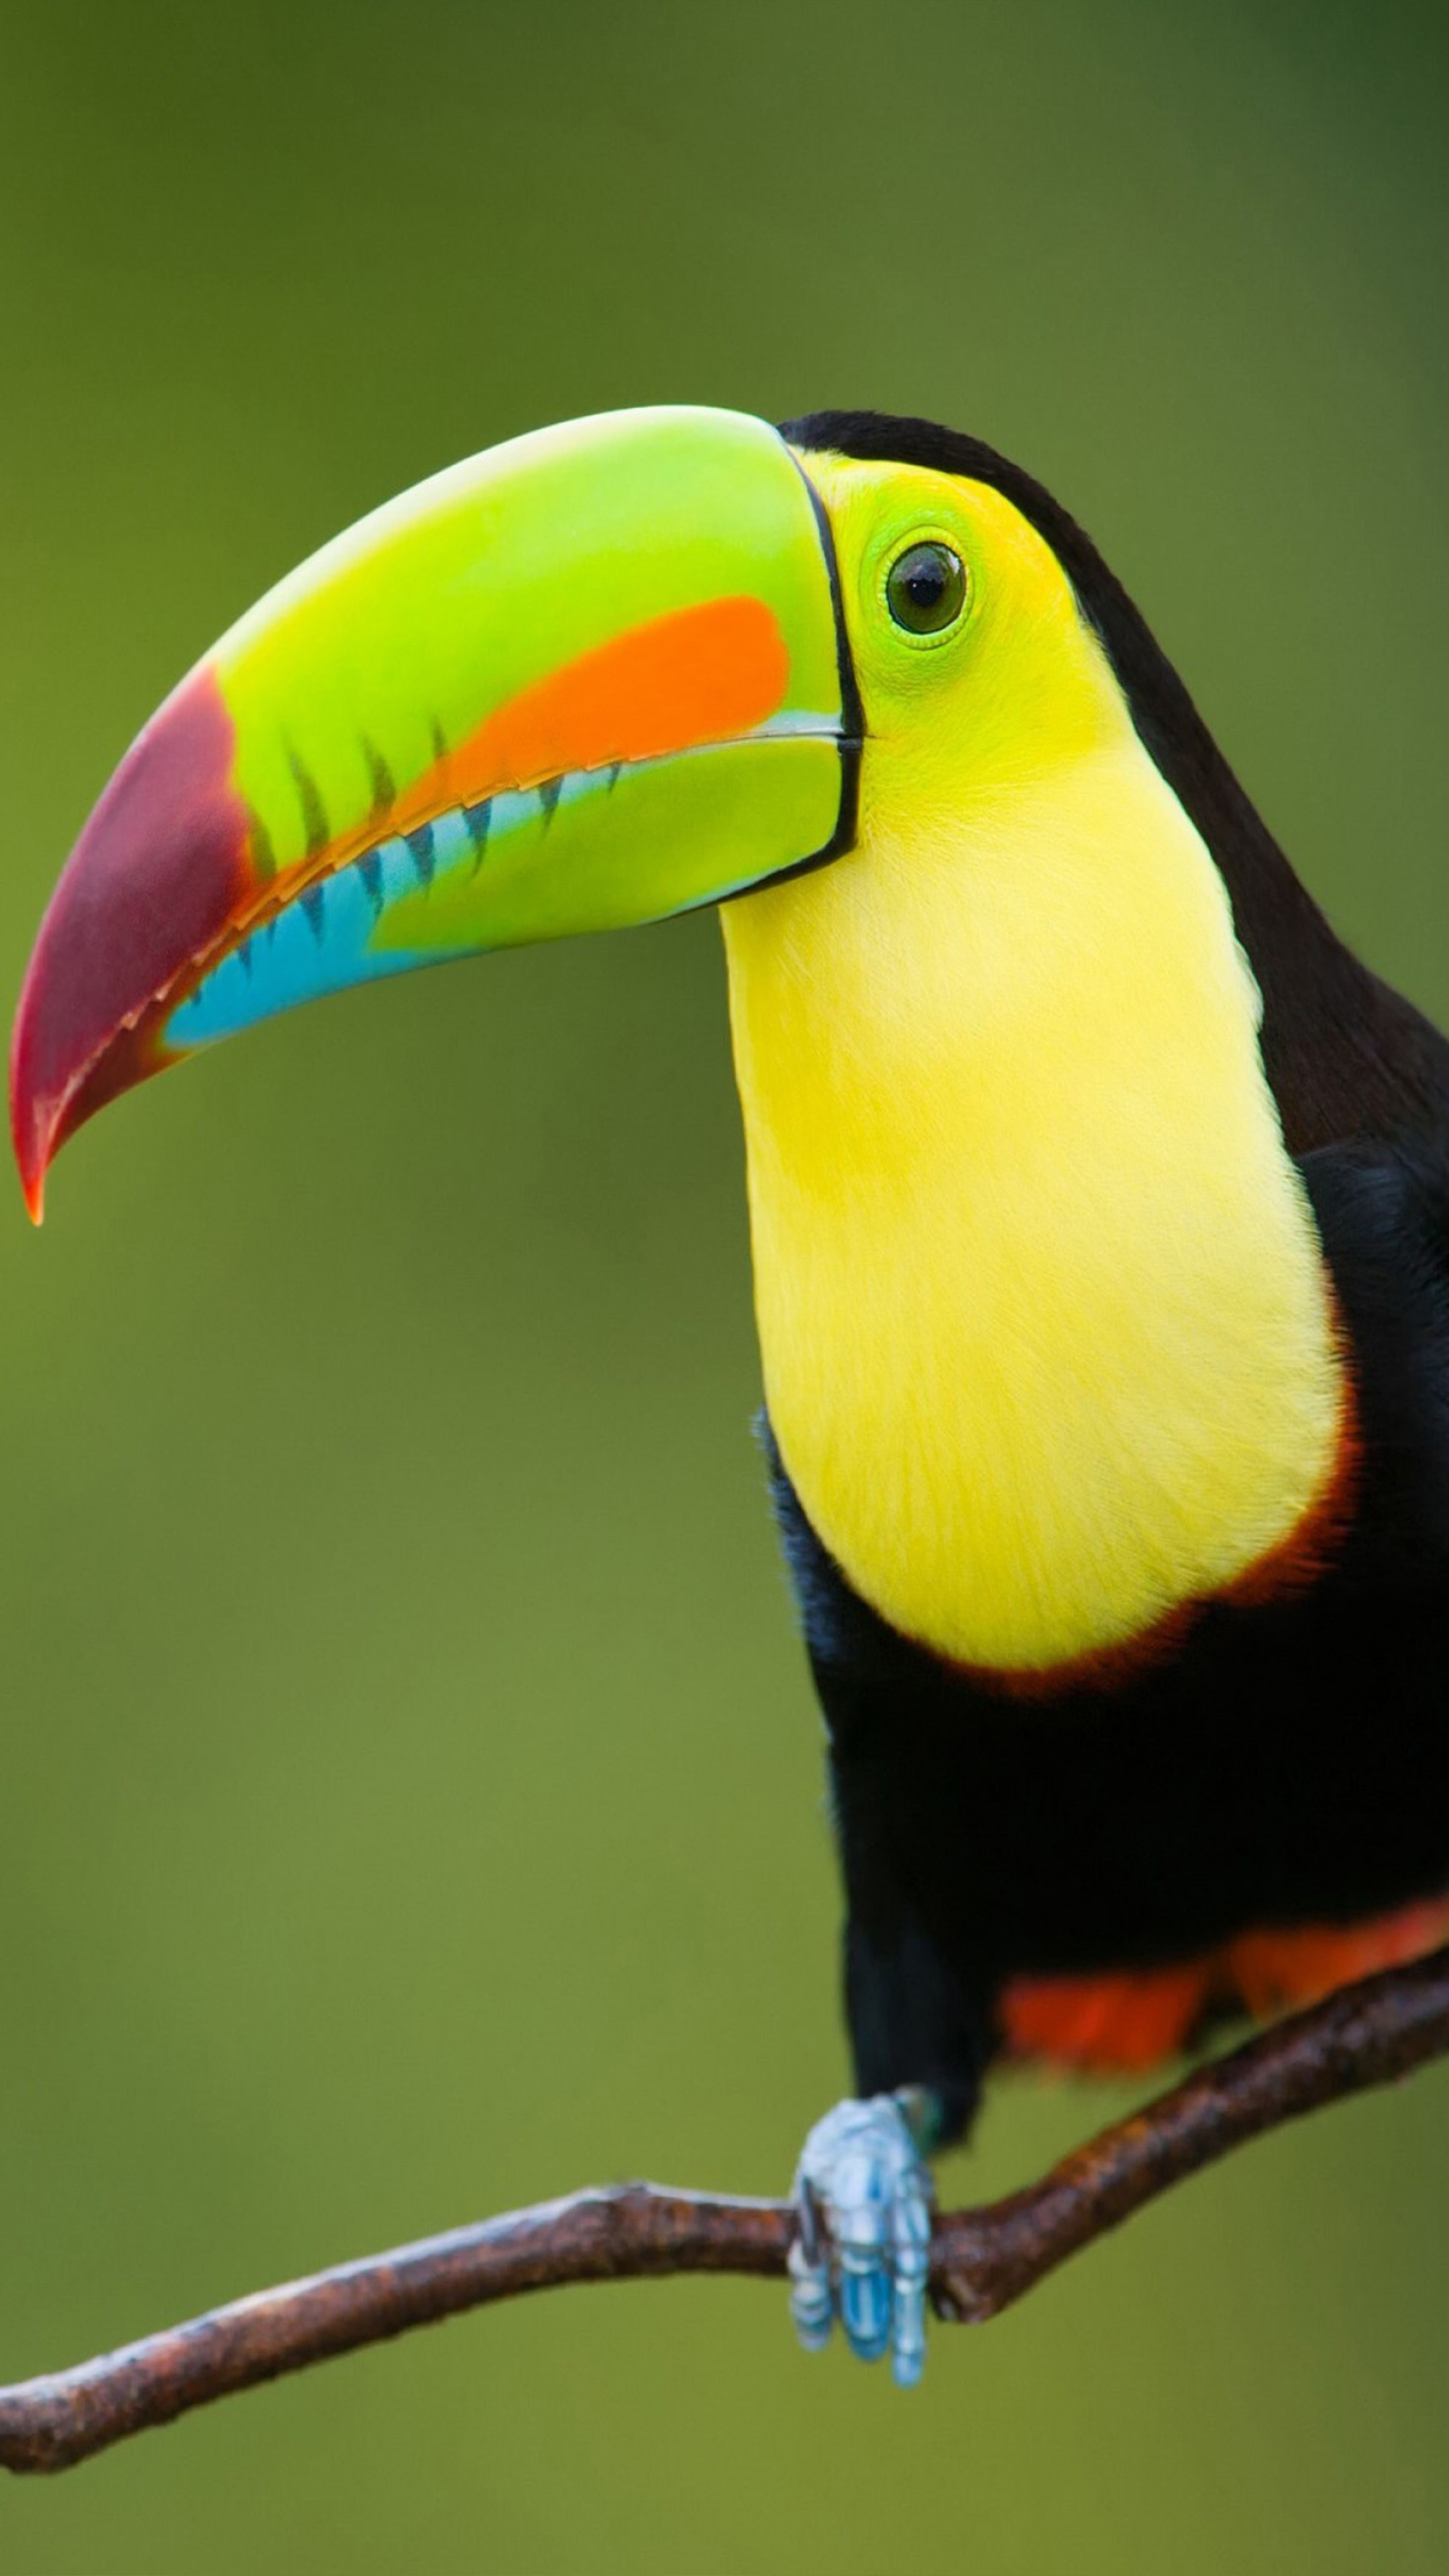 Toucan Bird 4k Ultra Hd Mobile Wallpaper